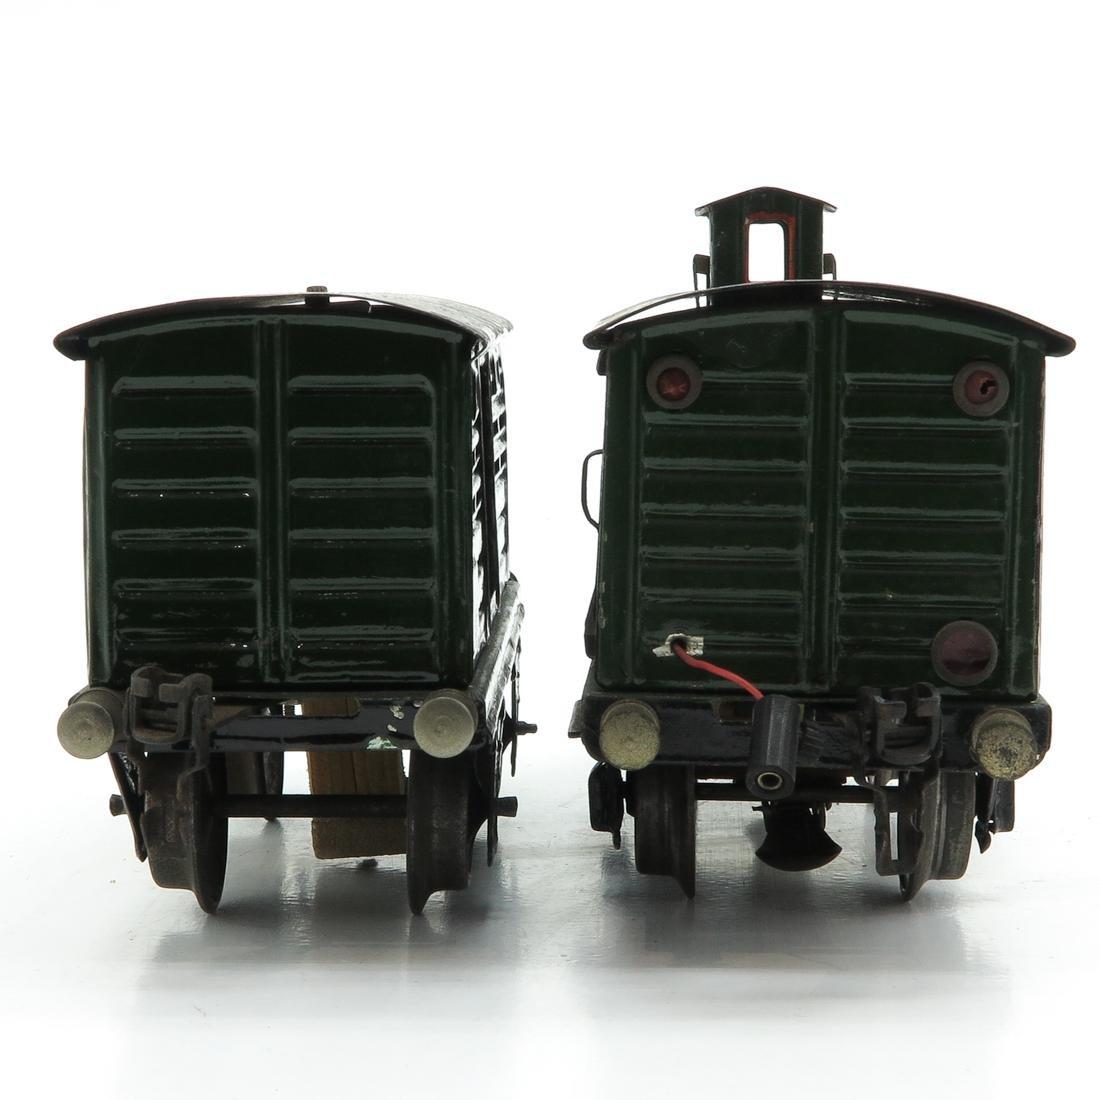 Lot of 2 Vintage Marklin Train Cars - 4